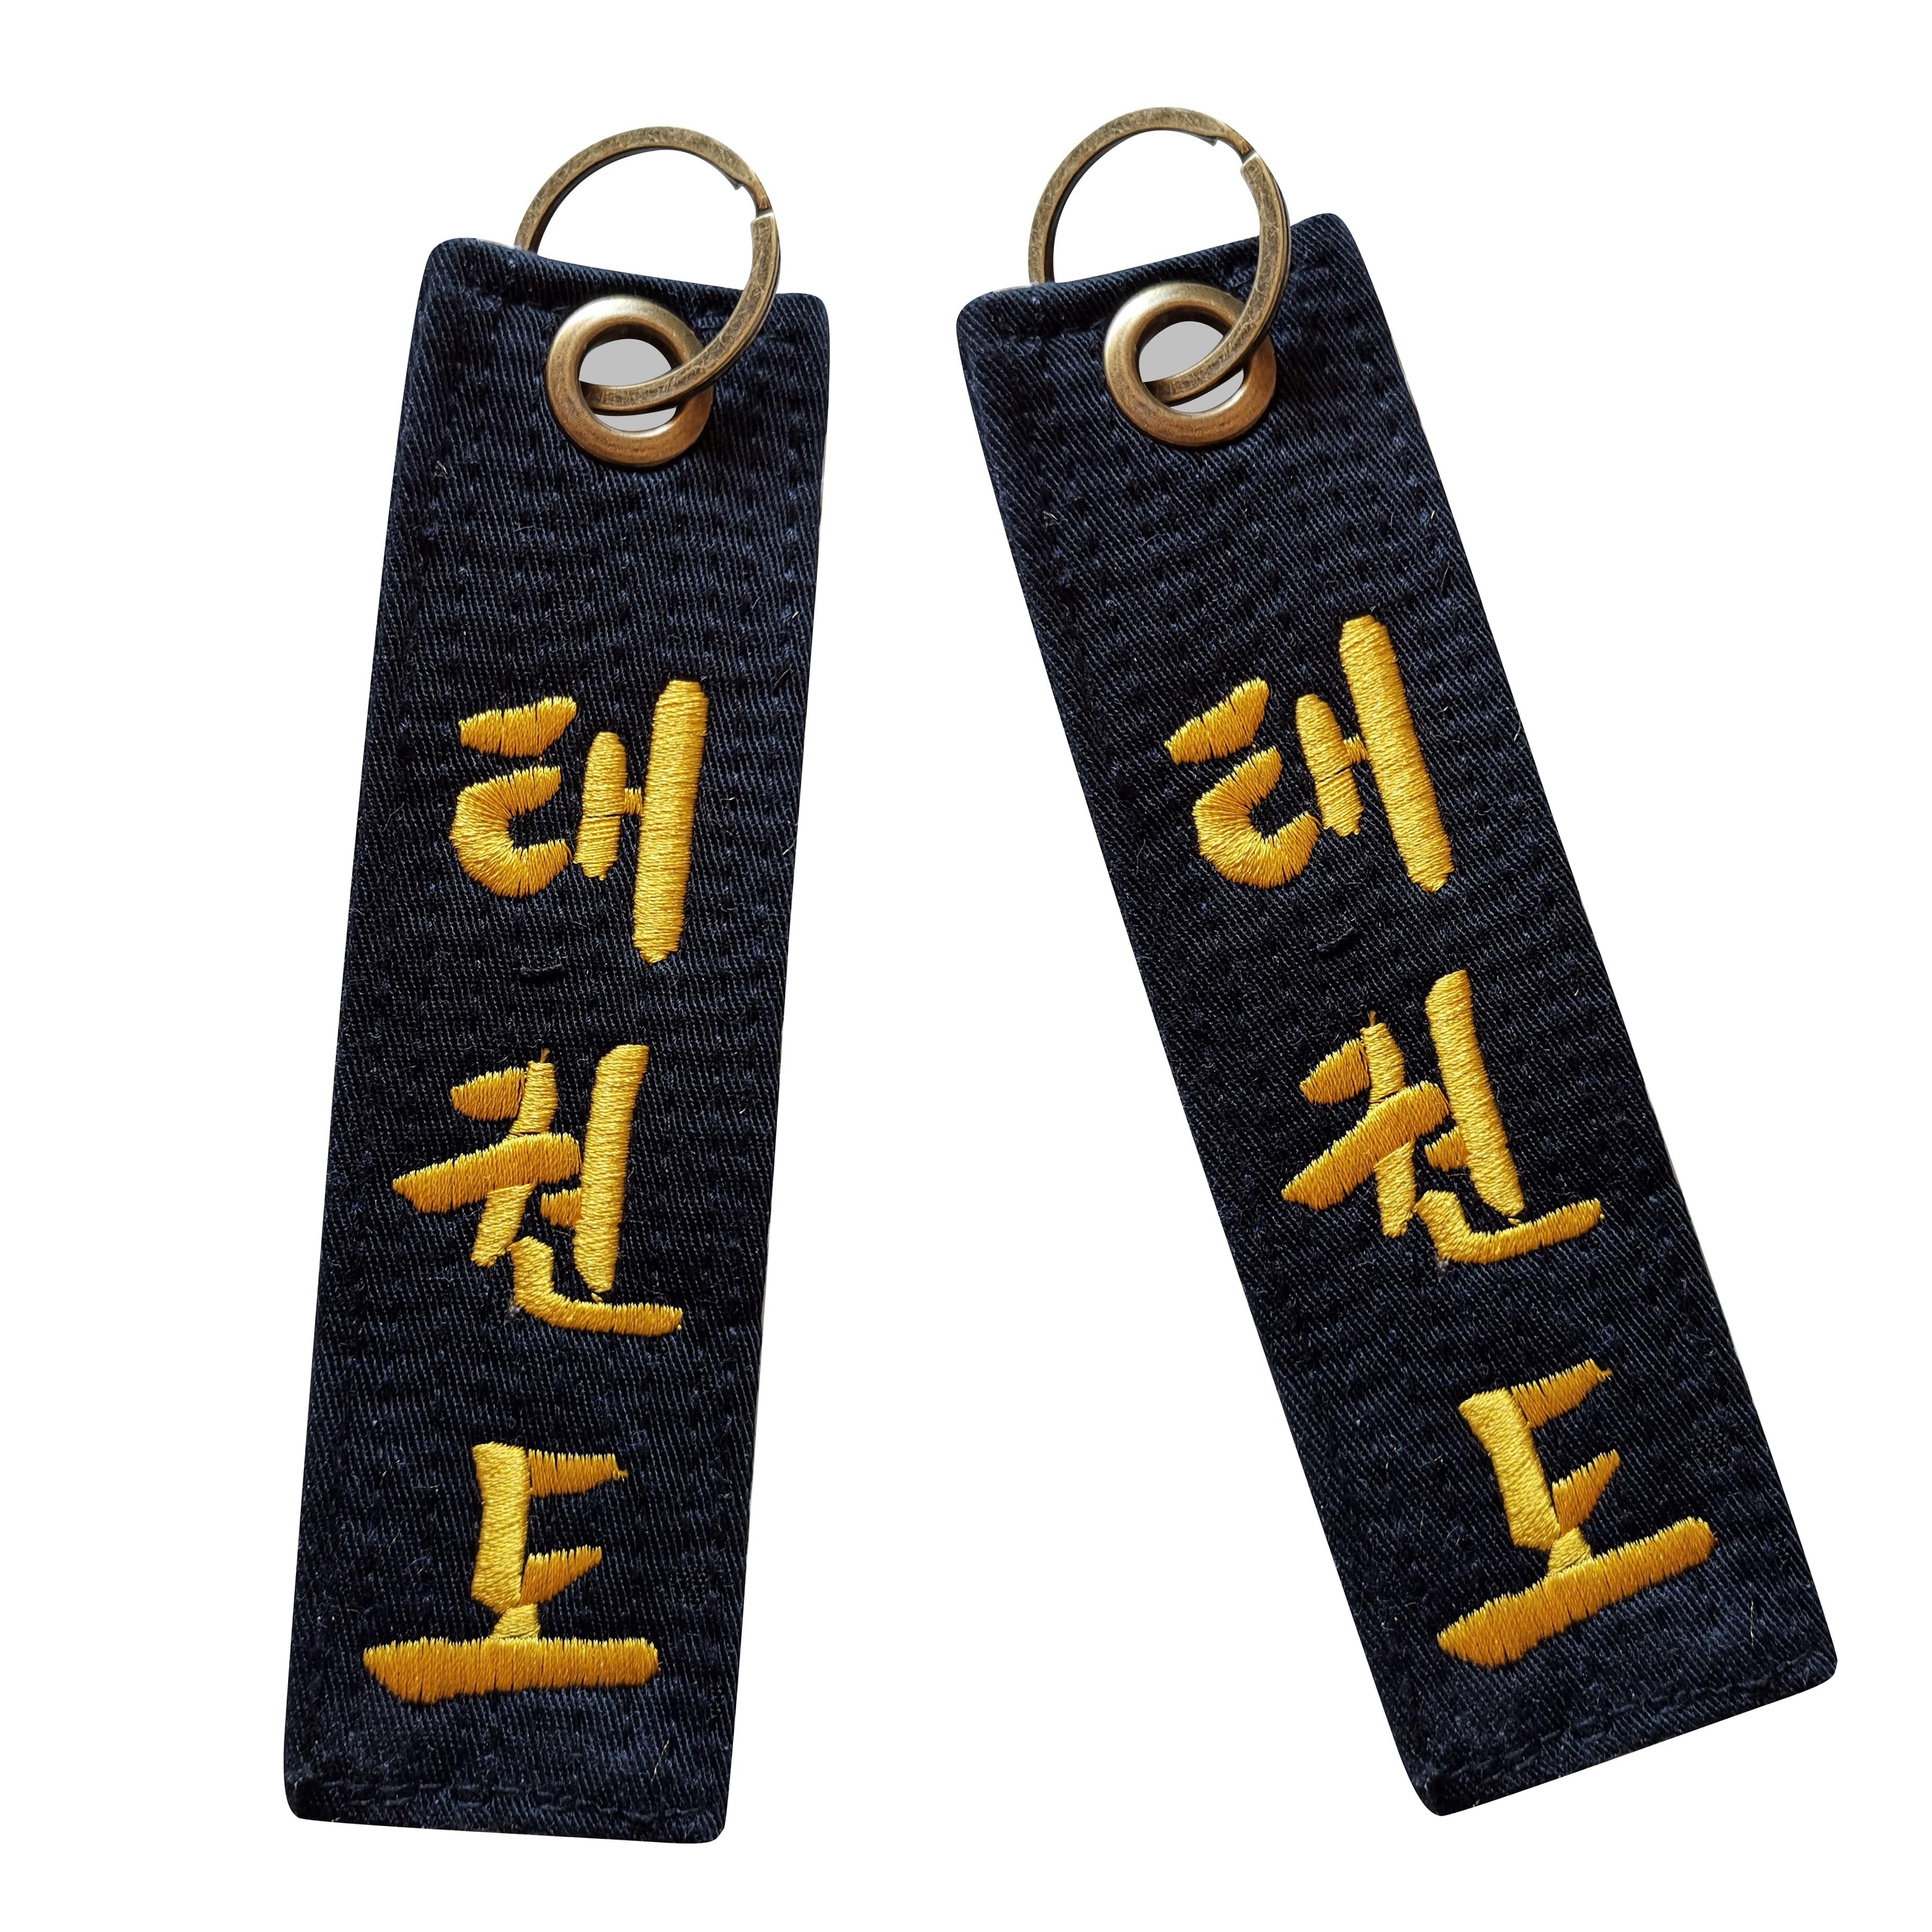 Hot Sale Keychain Taekwondo Supplies Black Belt Sport Gifts For Birthday Keepsake Pendant Key Button Key Ring Bag Pendant